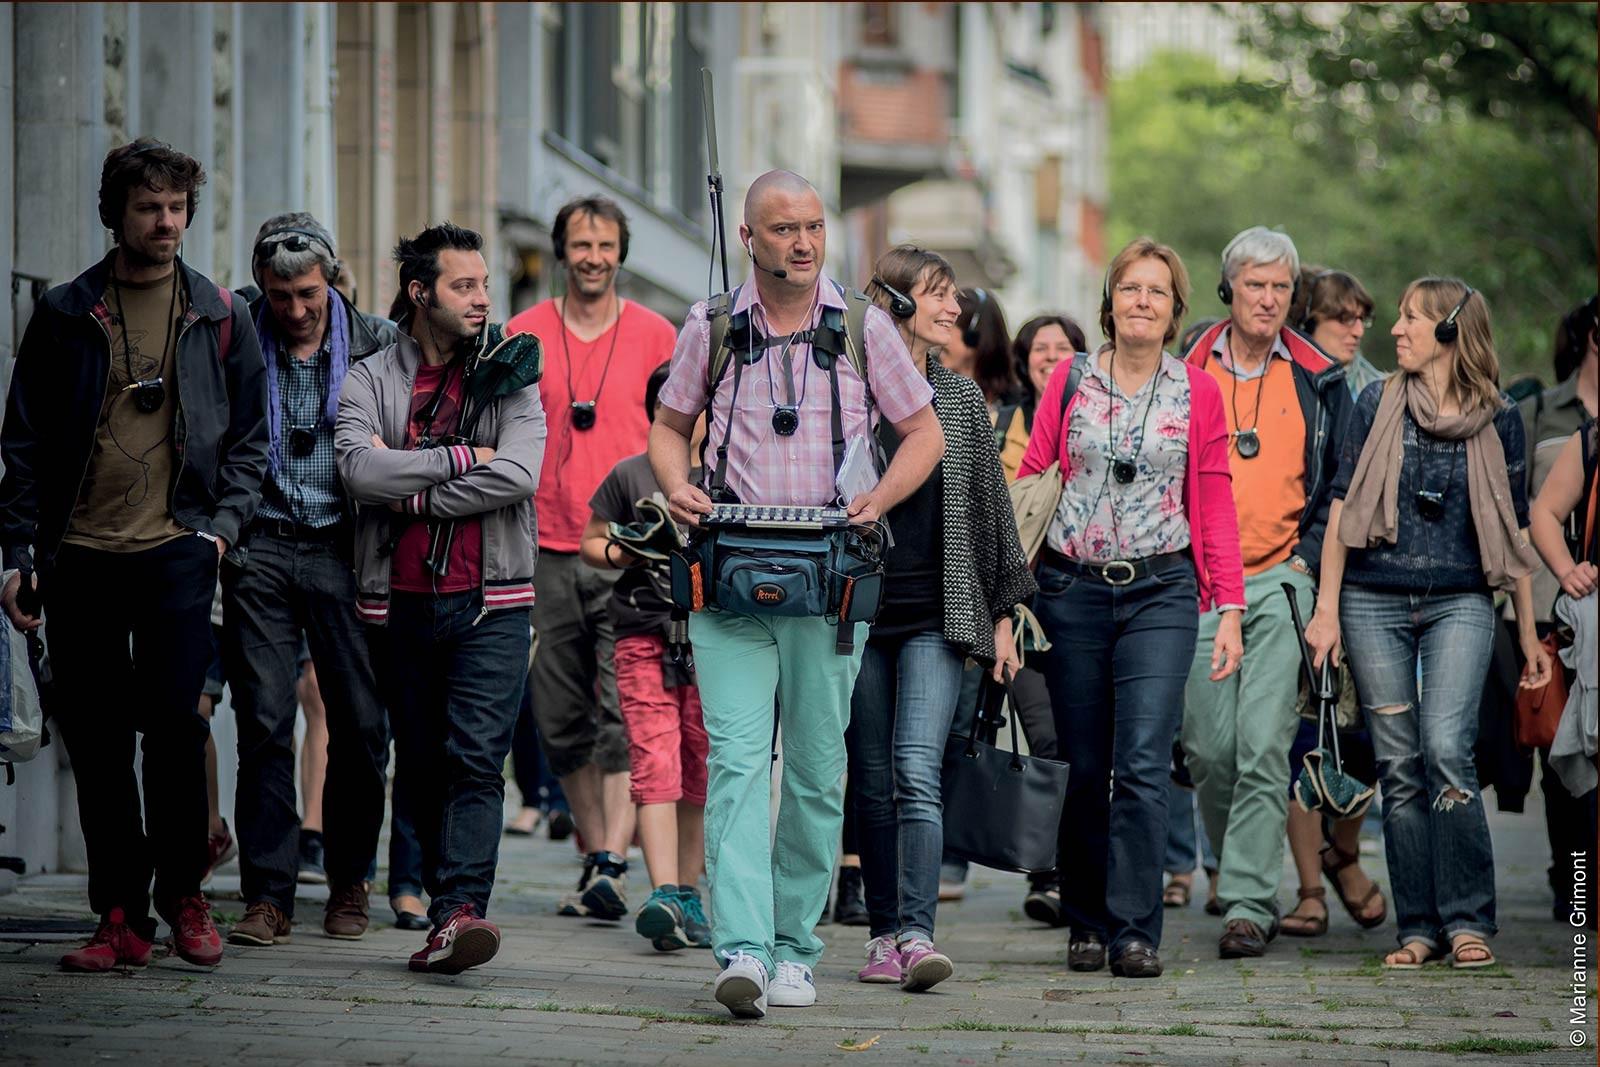 Walking thérapie festival charleroi bis-arts 2018